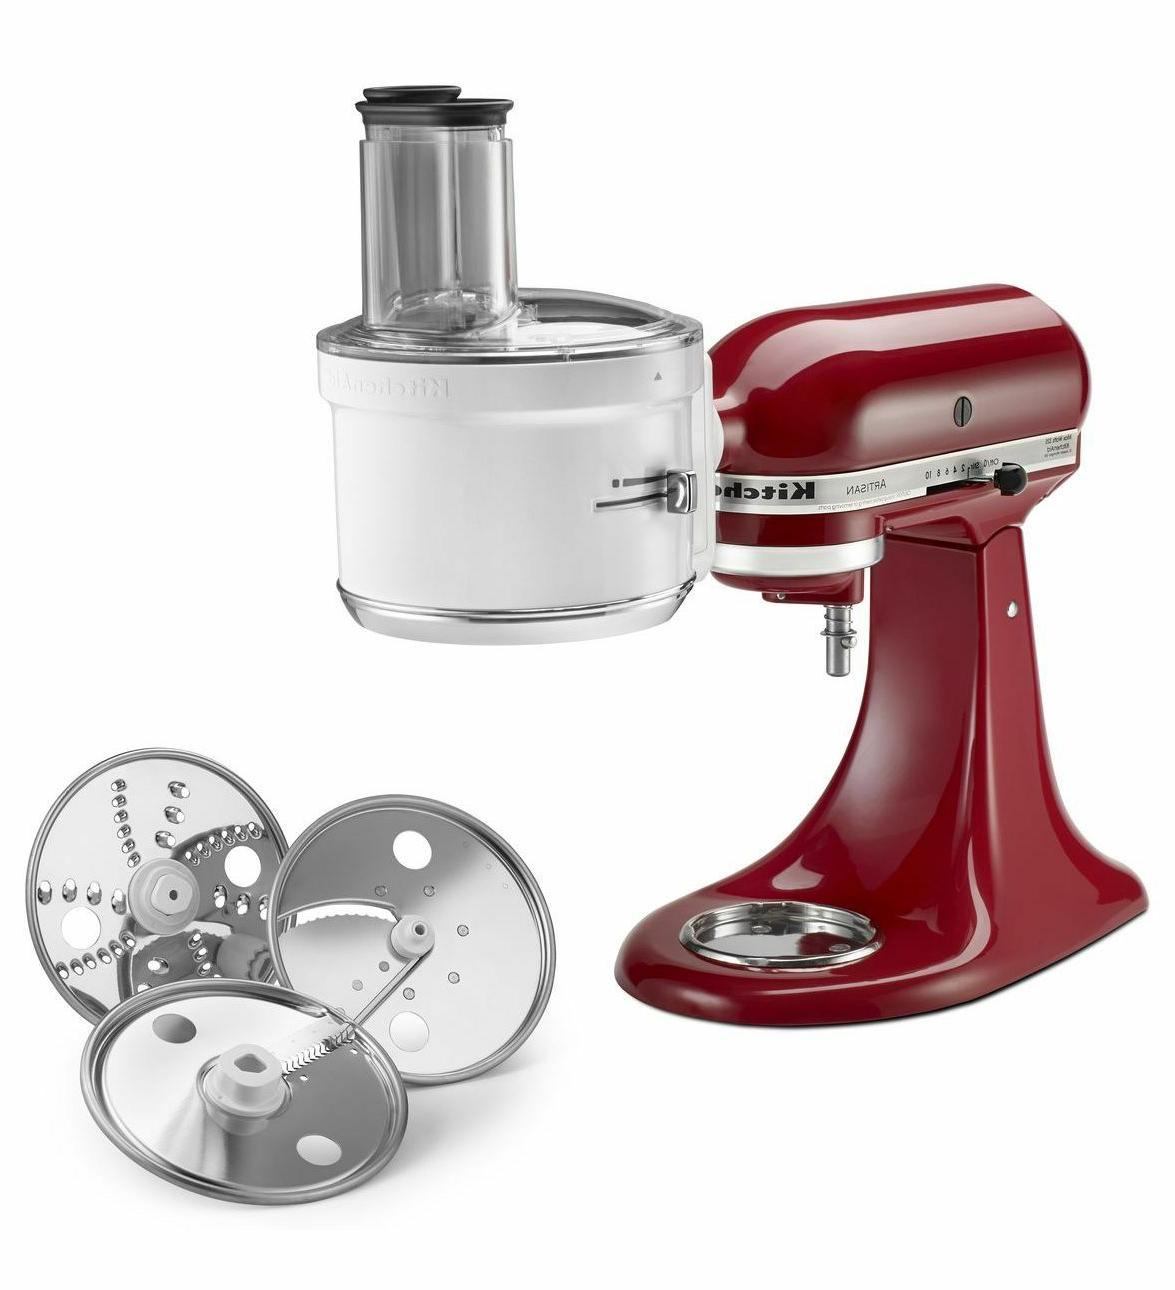 KitchenAid Exact-Slice Processor Attachment RKSM1FPA Mixers